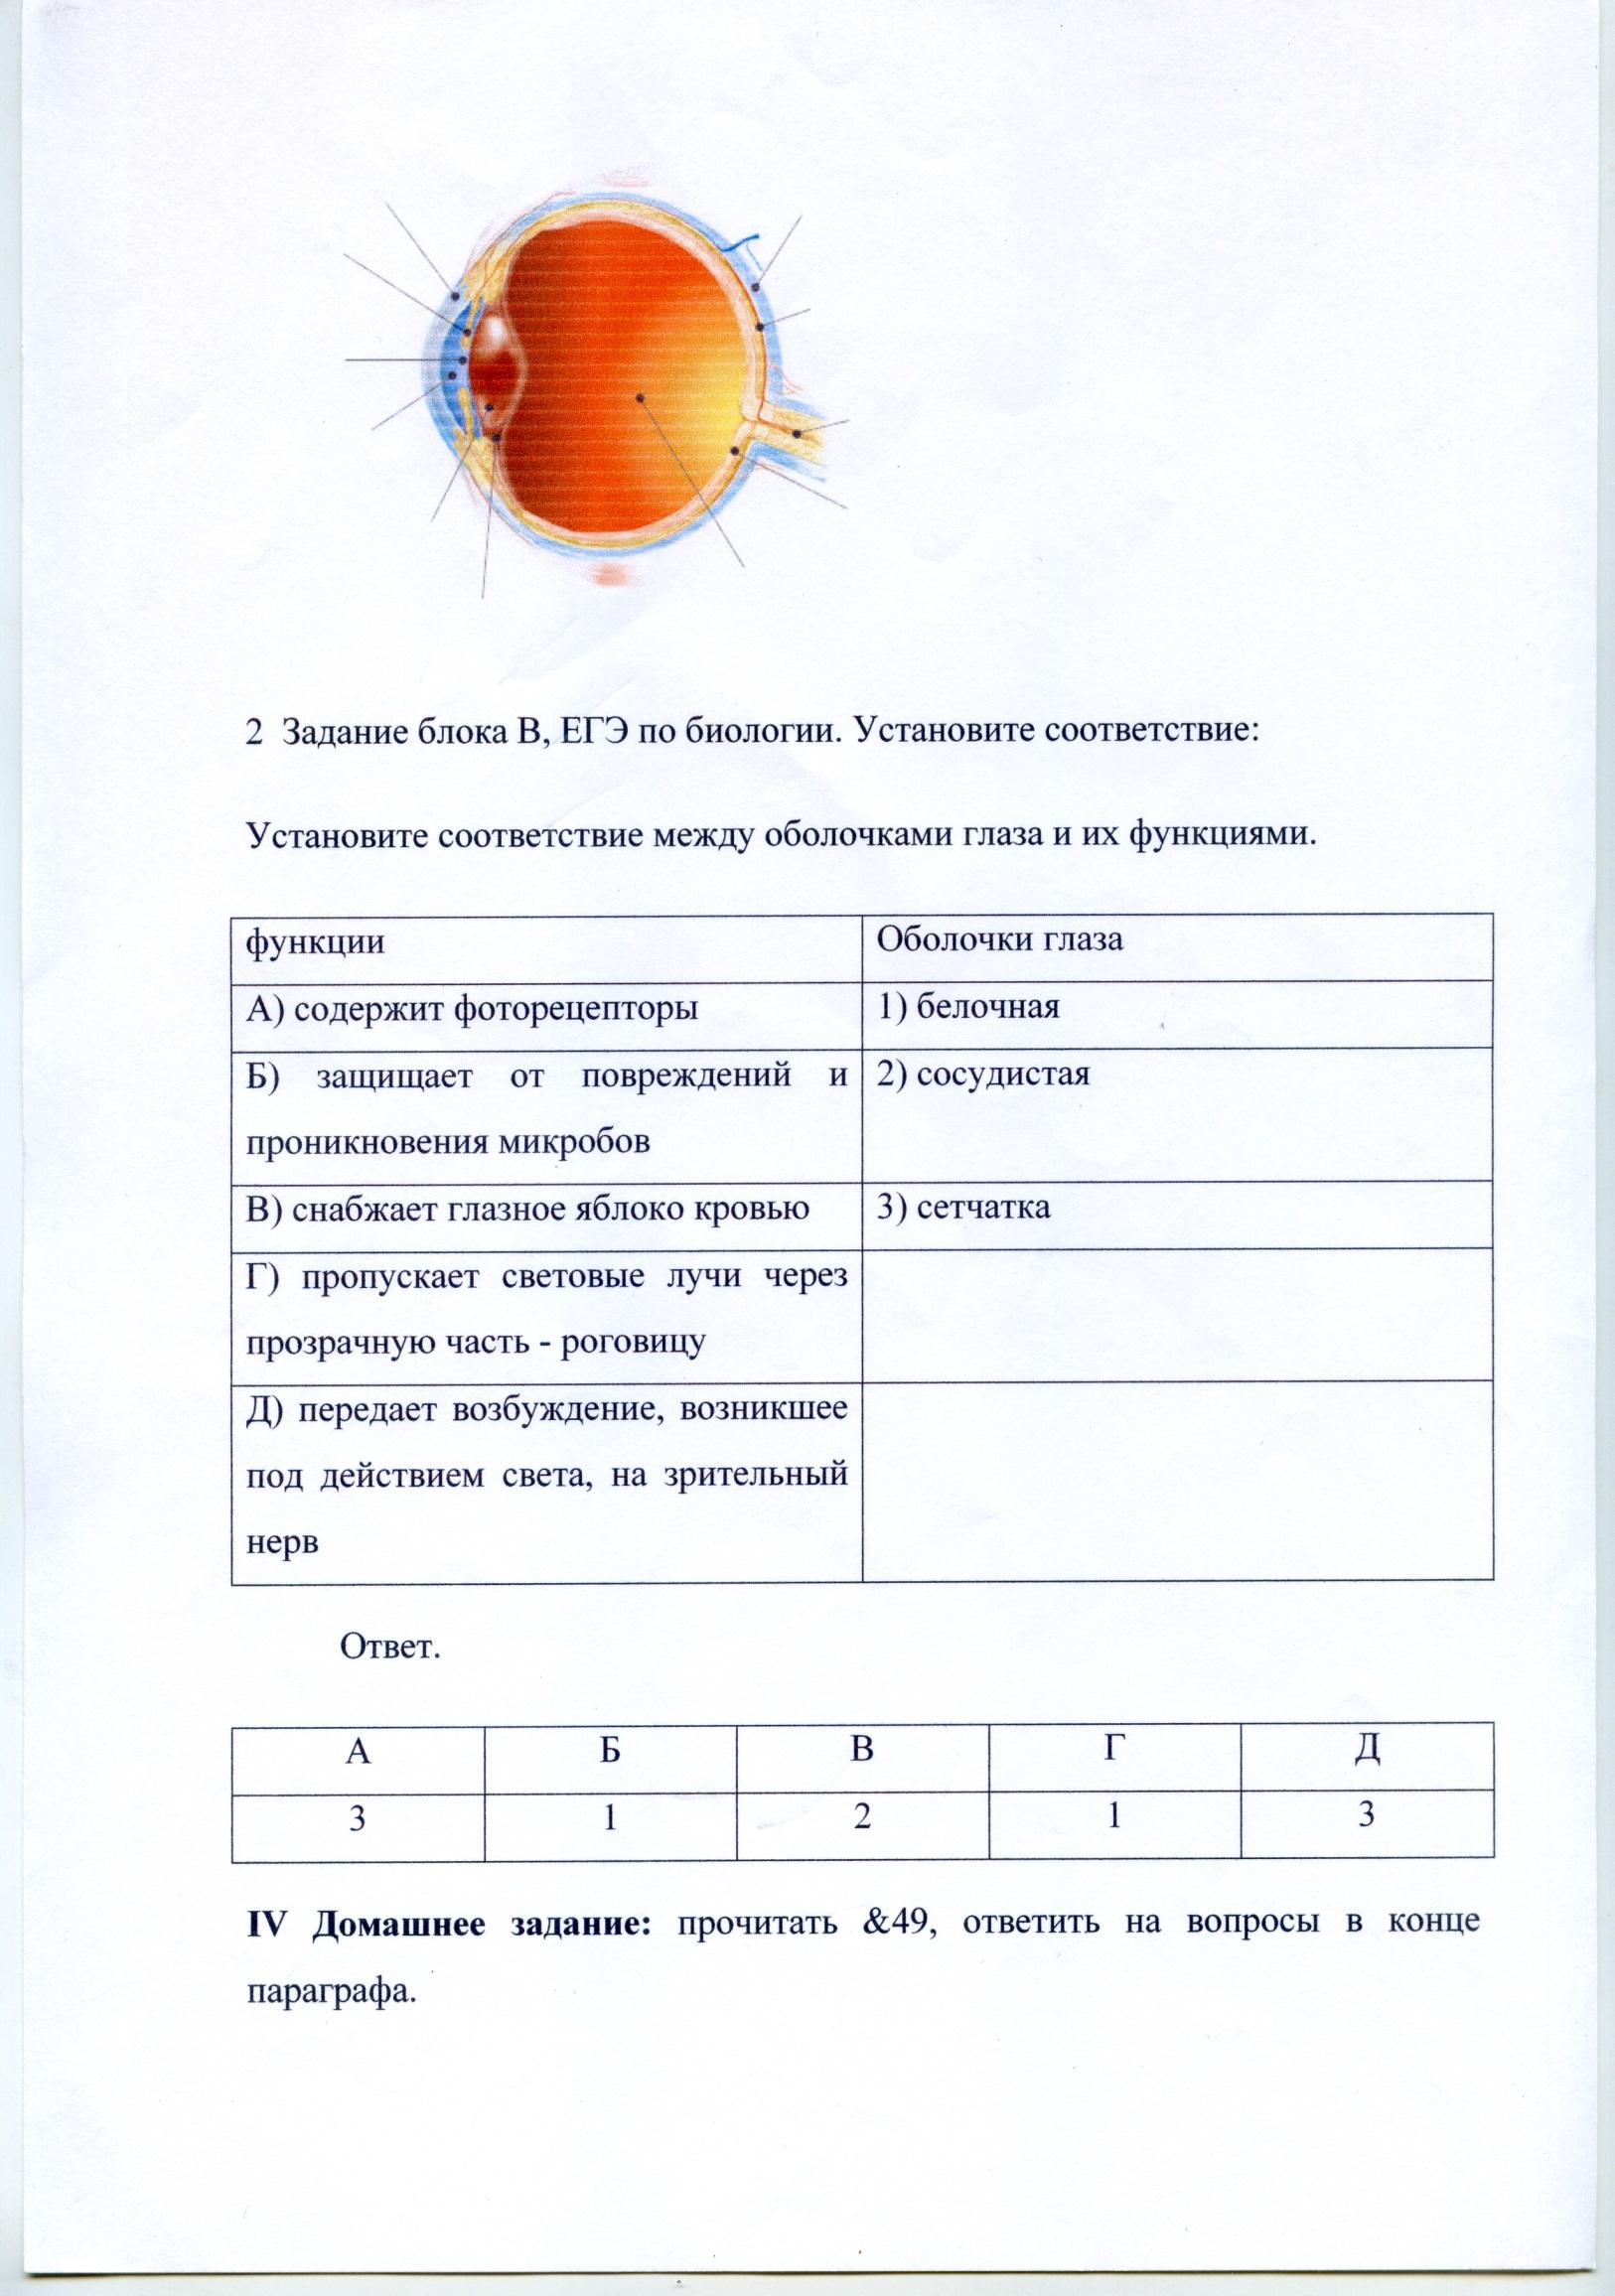 E:\File0015.jpg